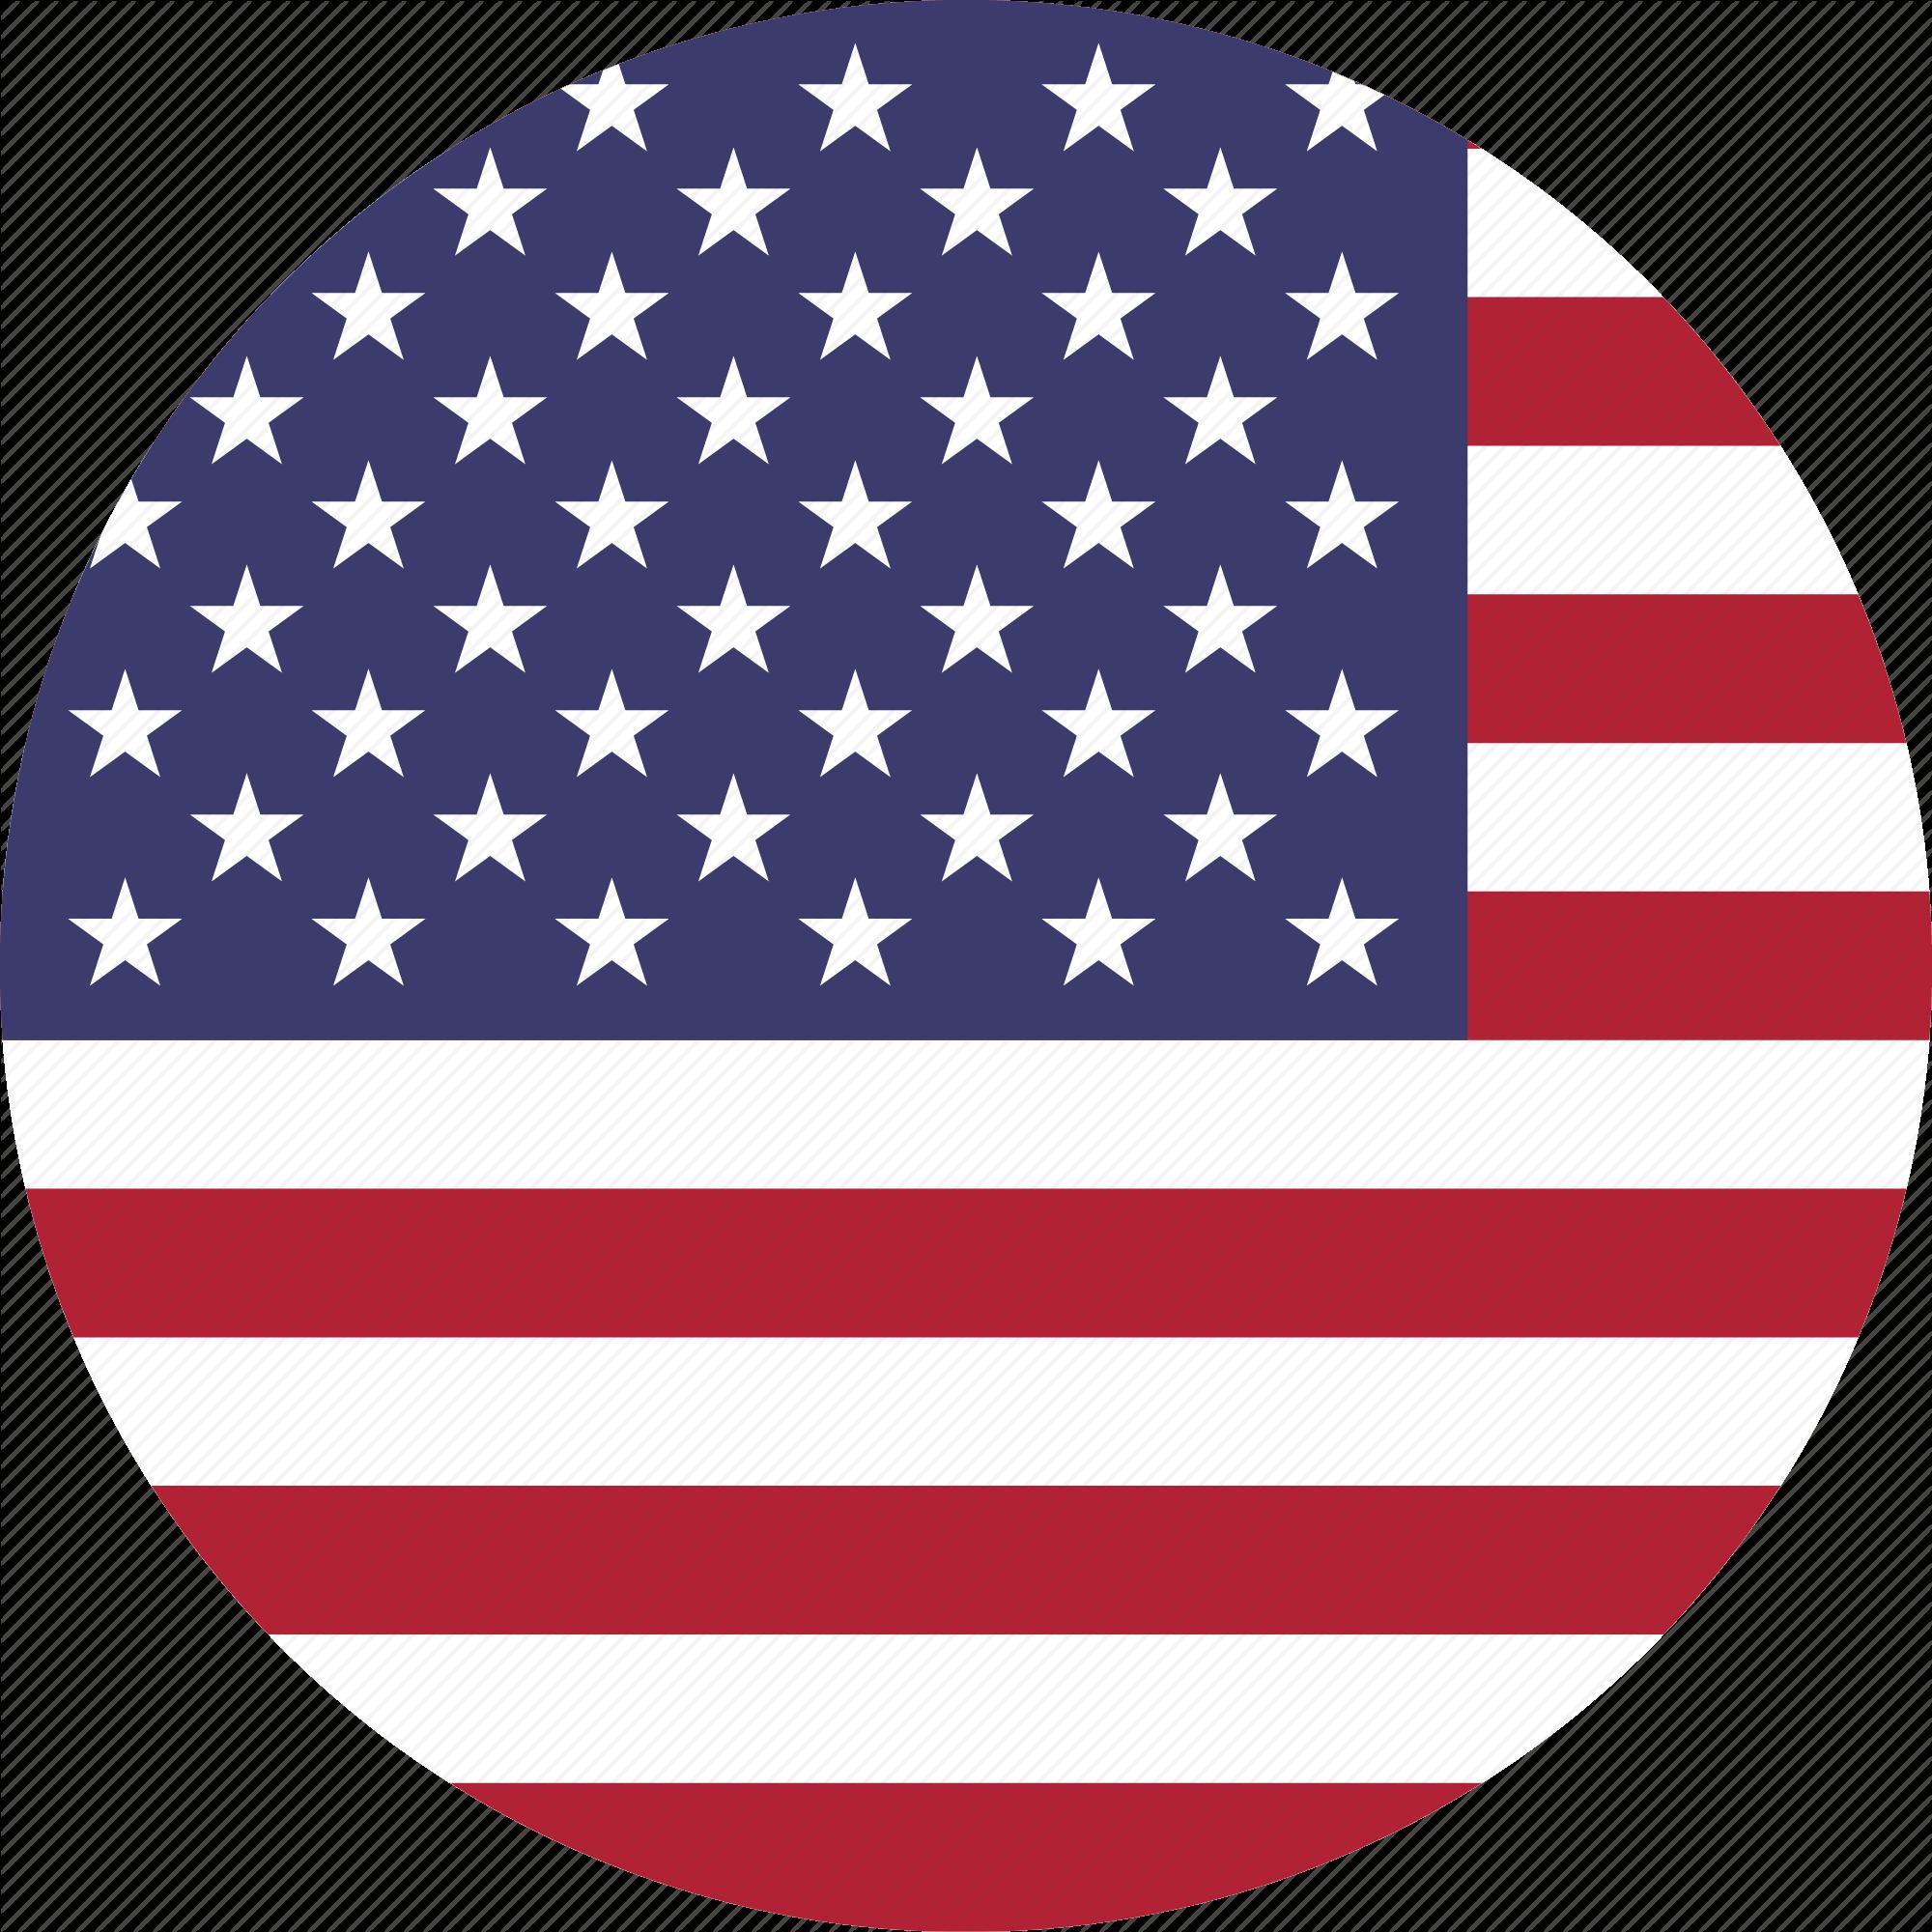 United states flag clipart free image freeuse library Image of USA Flag – Waving, GIF, PNG, Emoji | Flag Images image freeuse library